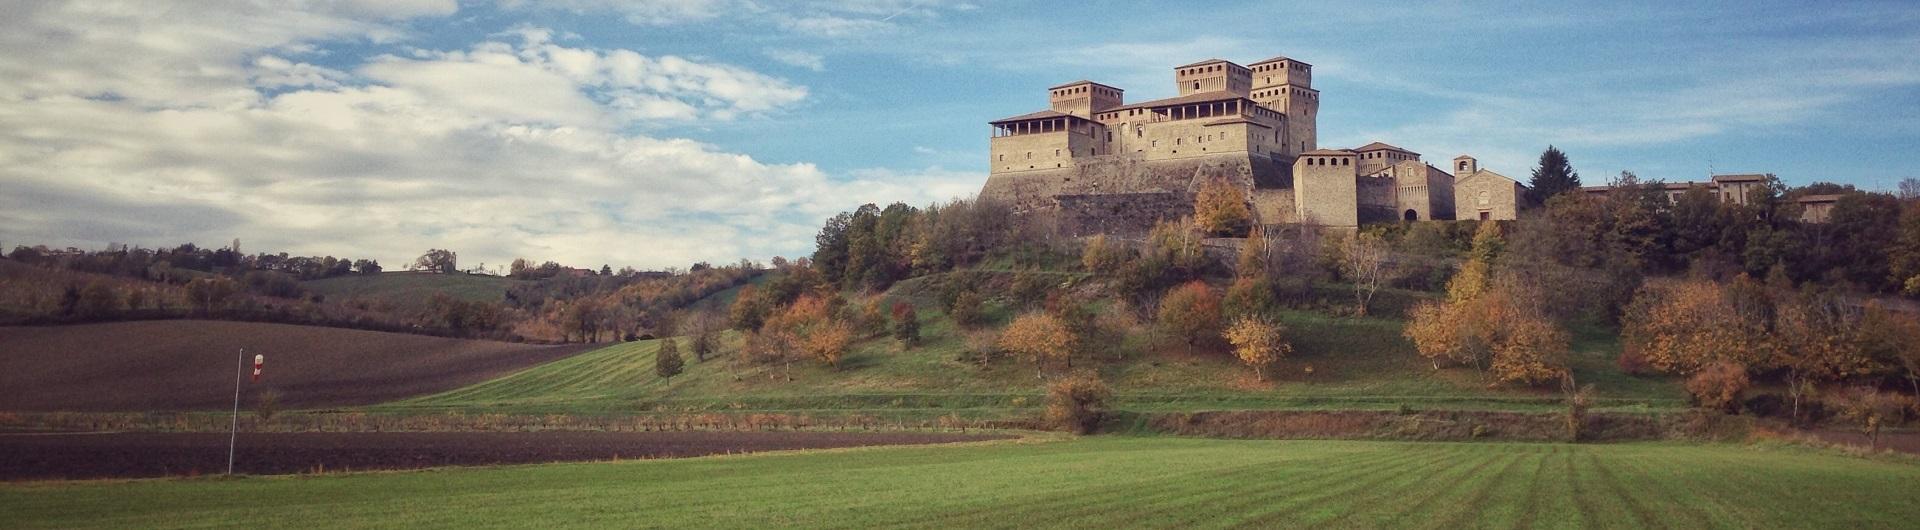 Bianca pellegrina e la Via di Linari – passeggiata guidata a Torrechiara